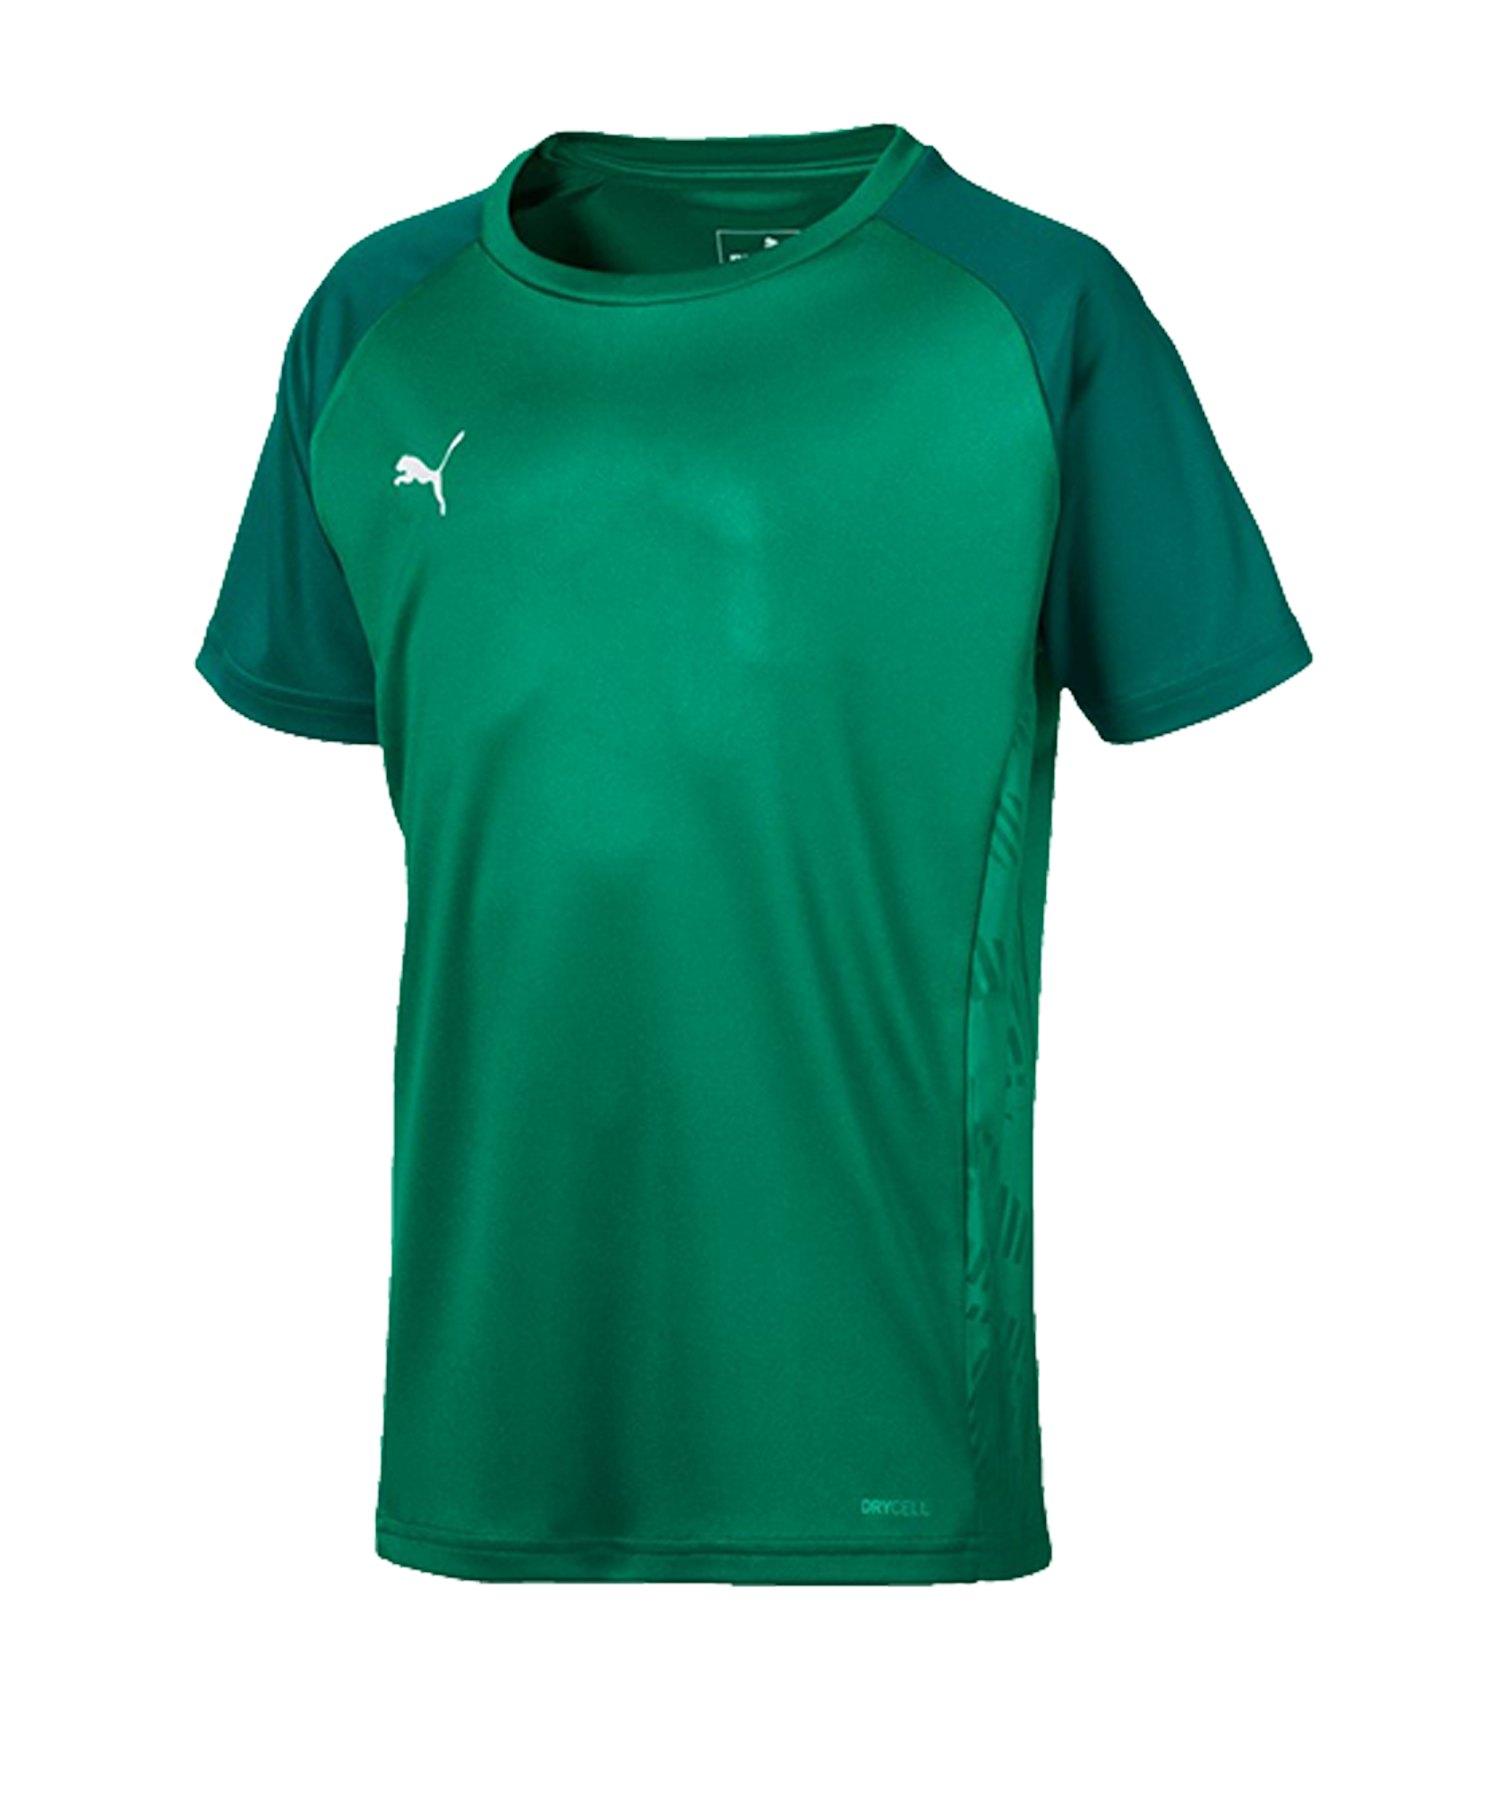 PUMA CUP Sideline Core T-Shirt Kids Grün F05 - gruen